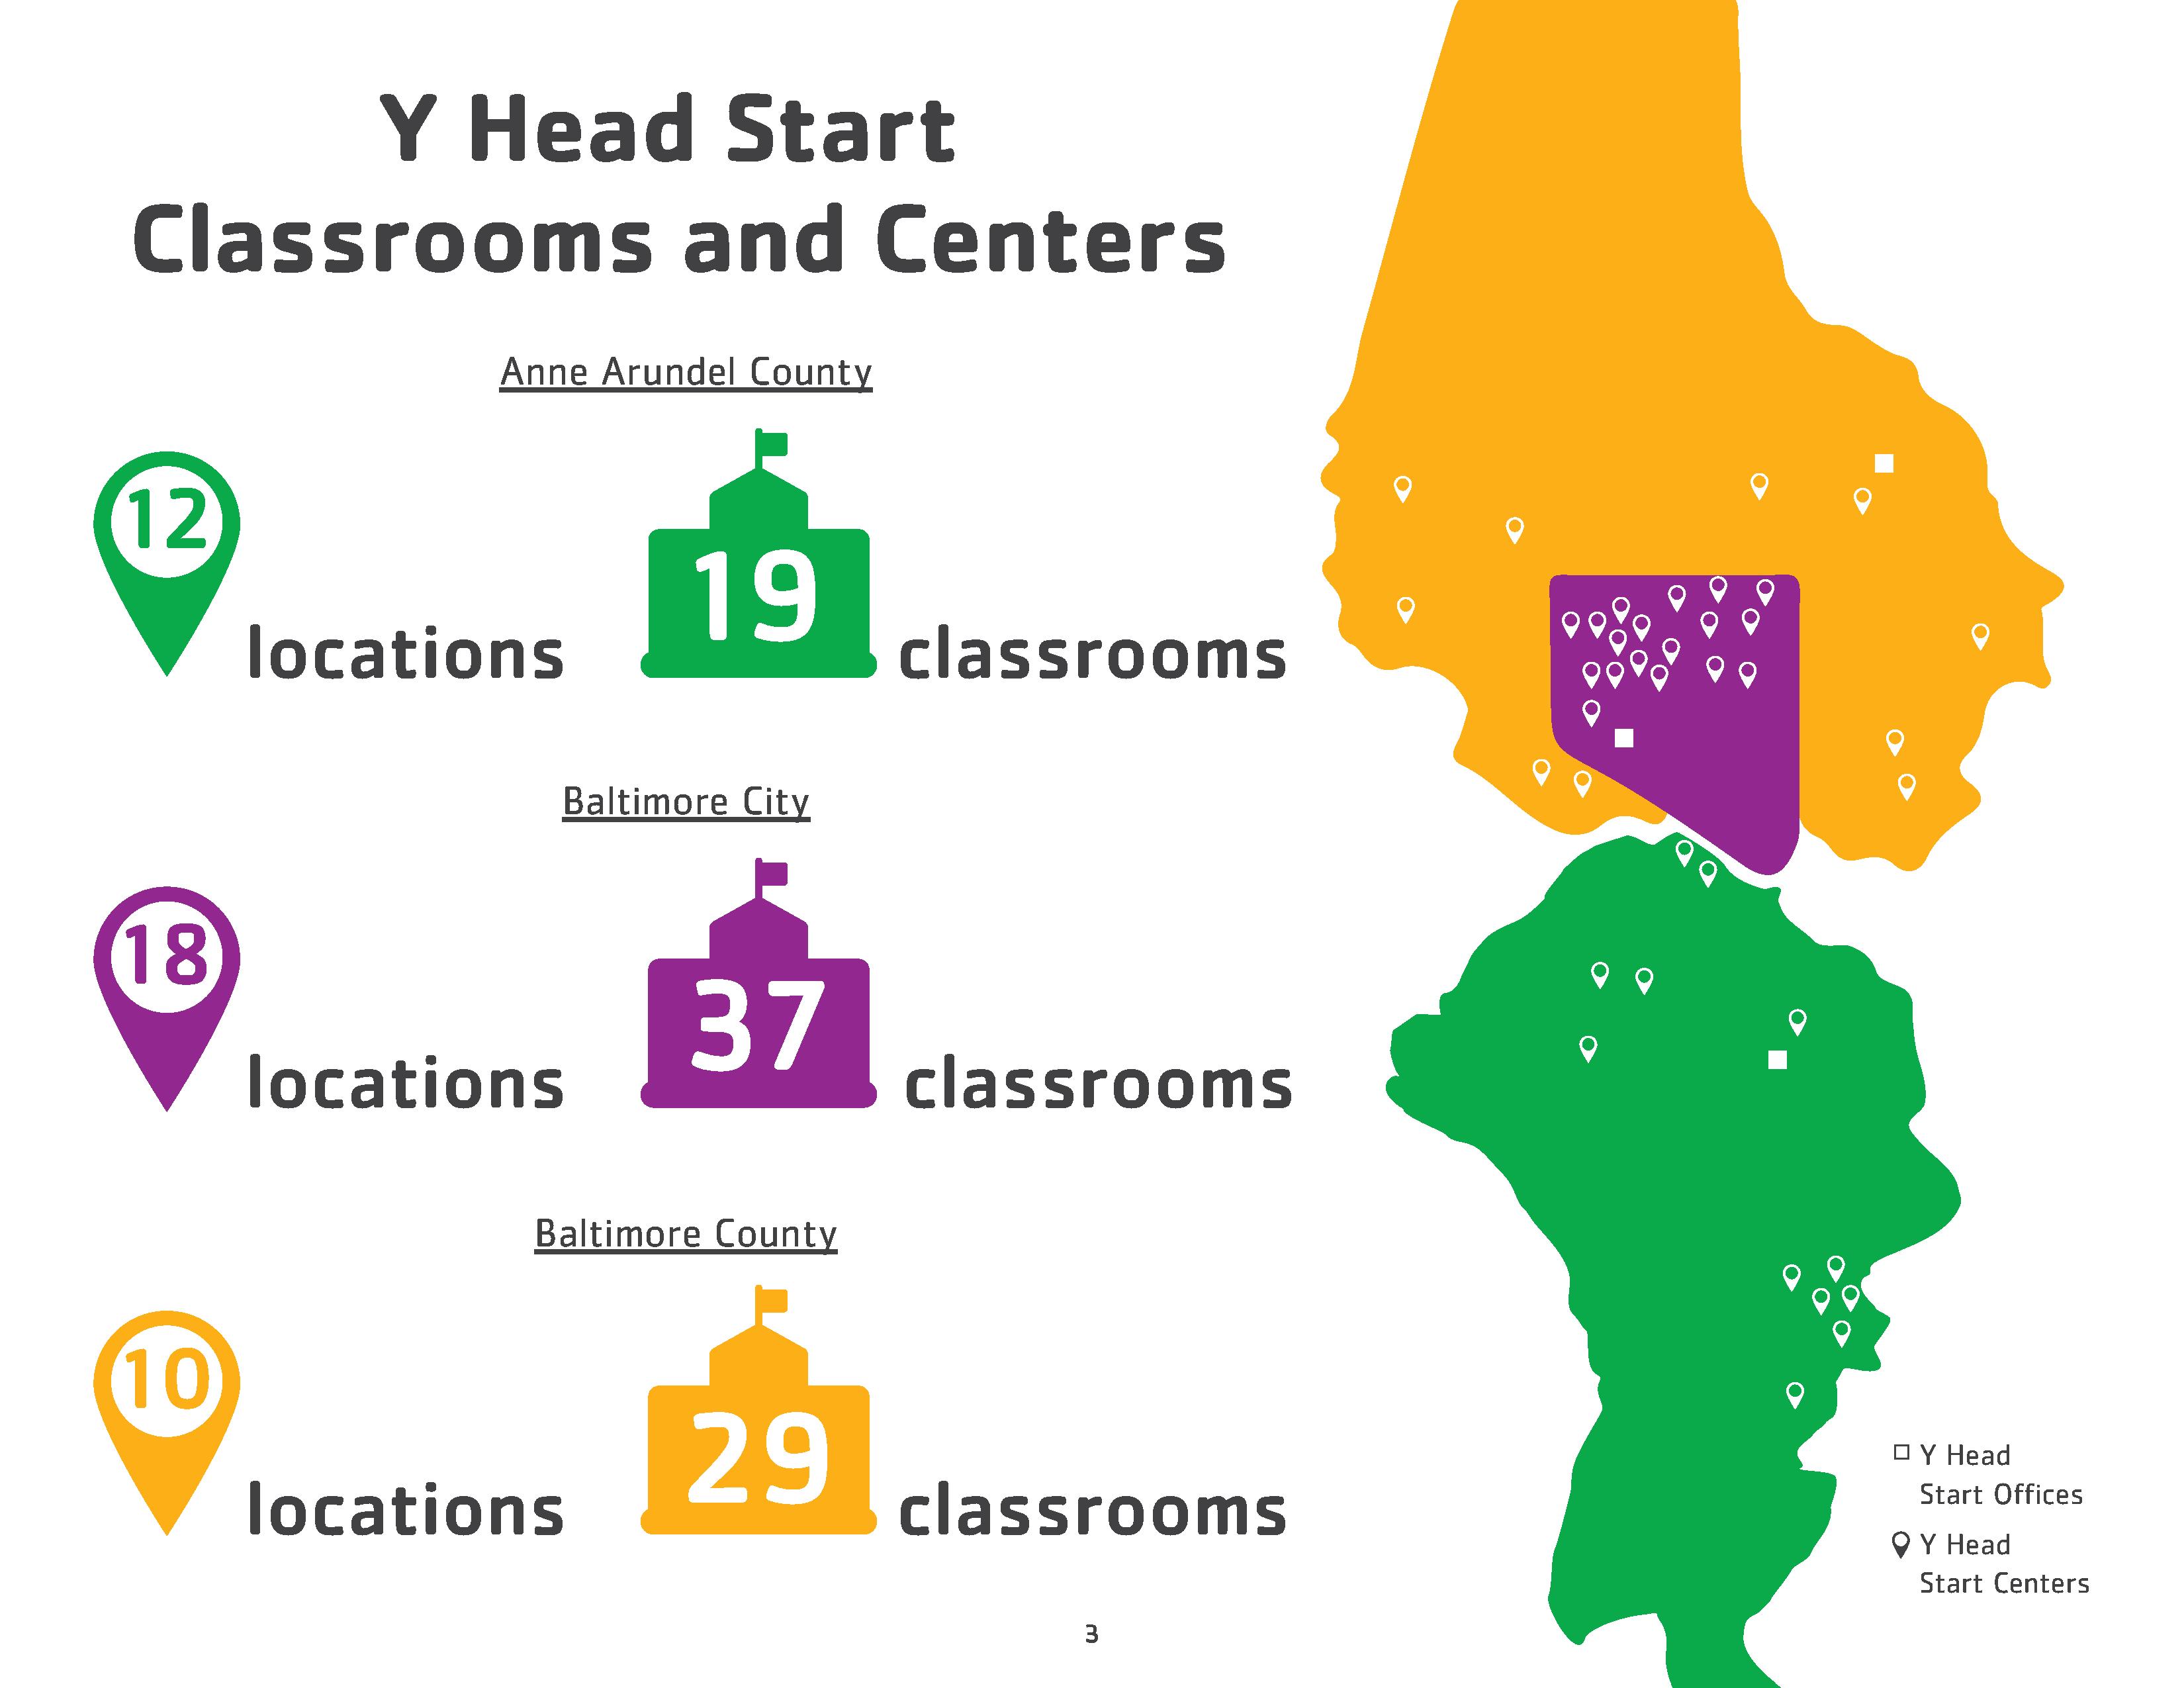 Head Start Classrooms & Locations